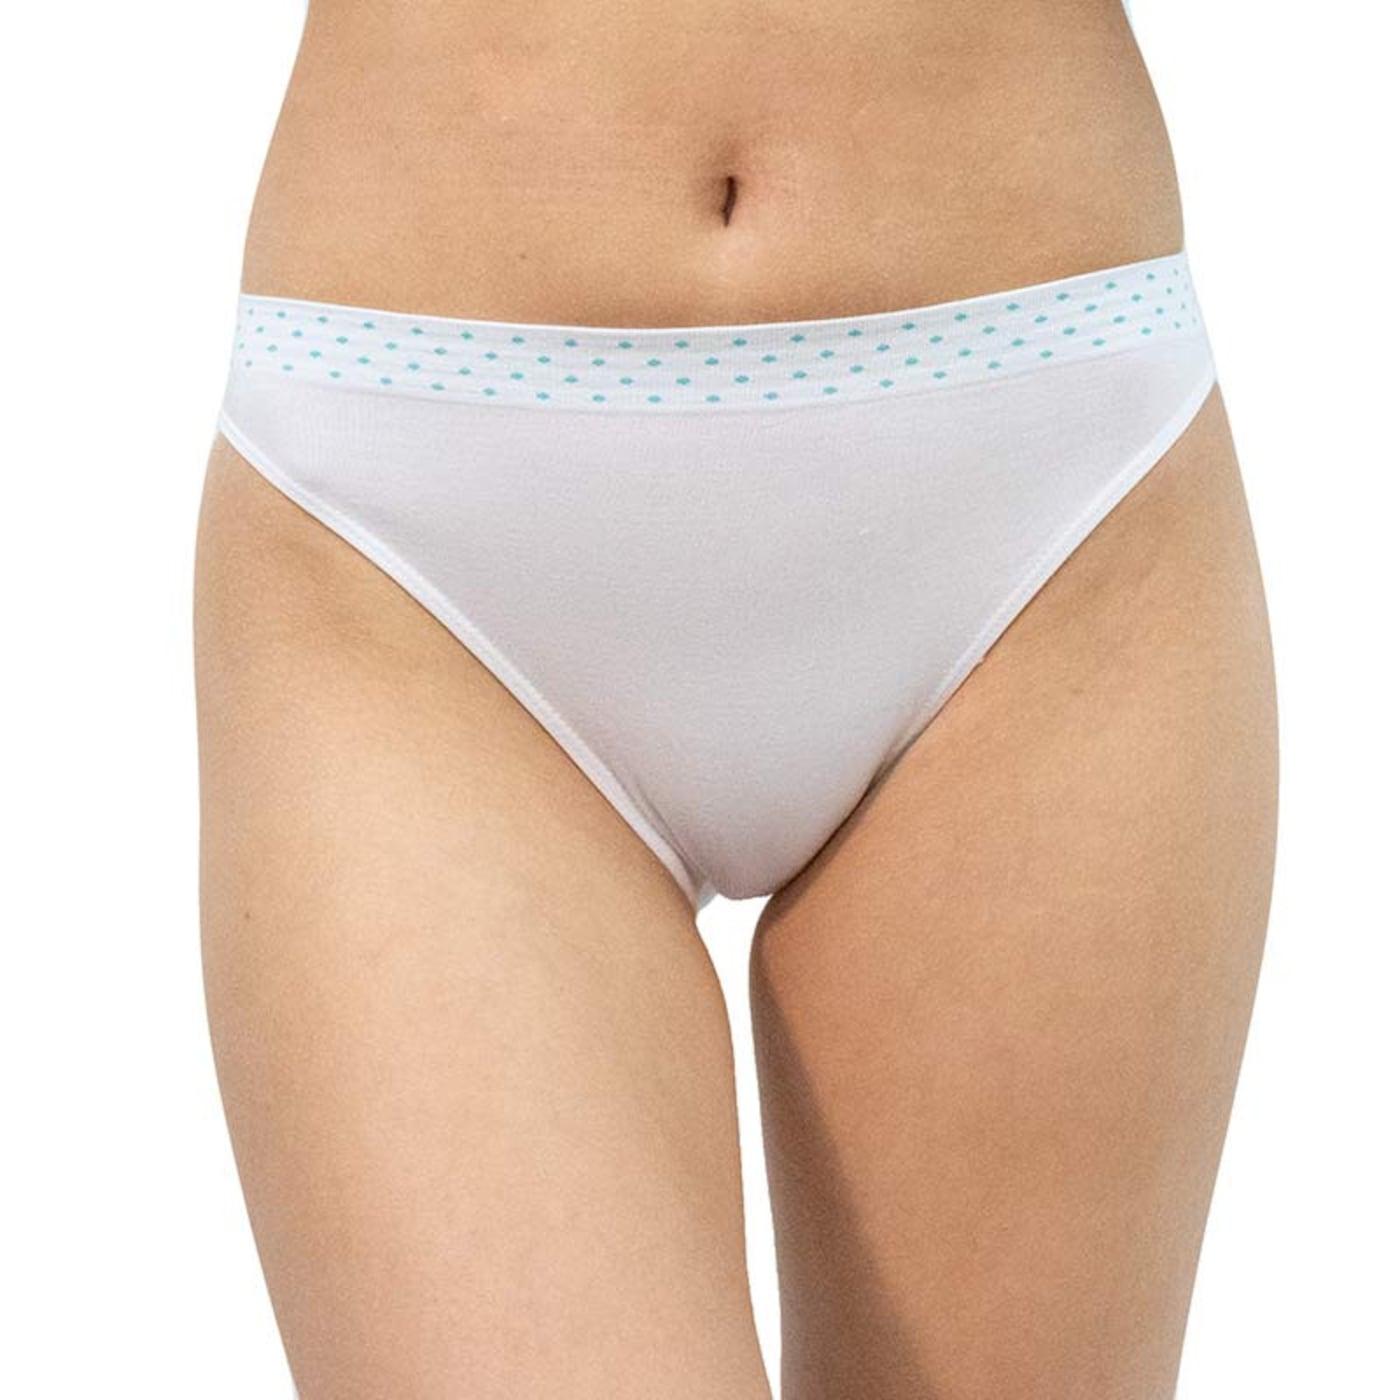 Women's panties Gina white  dámské Neurčeno L